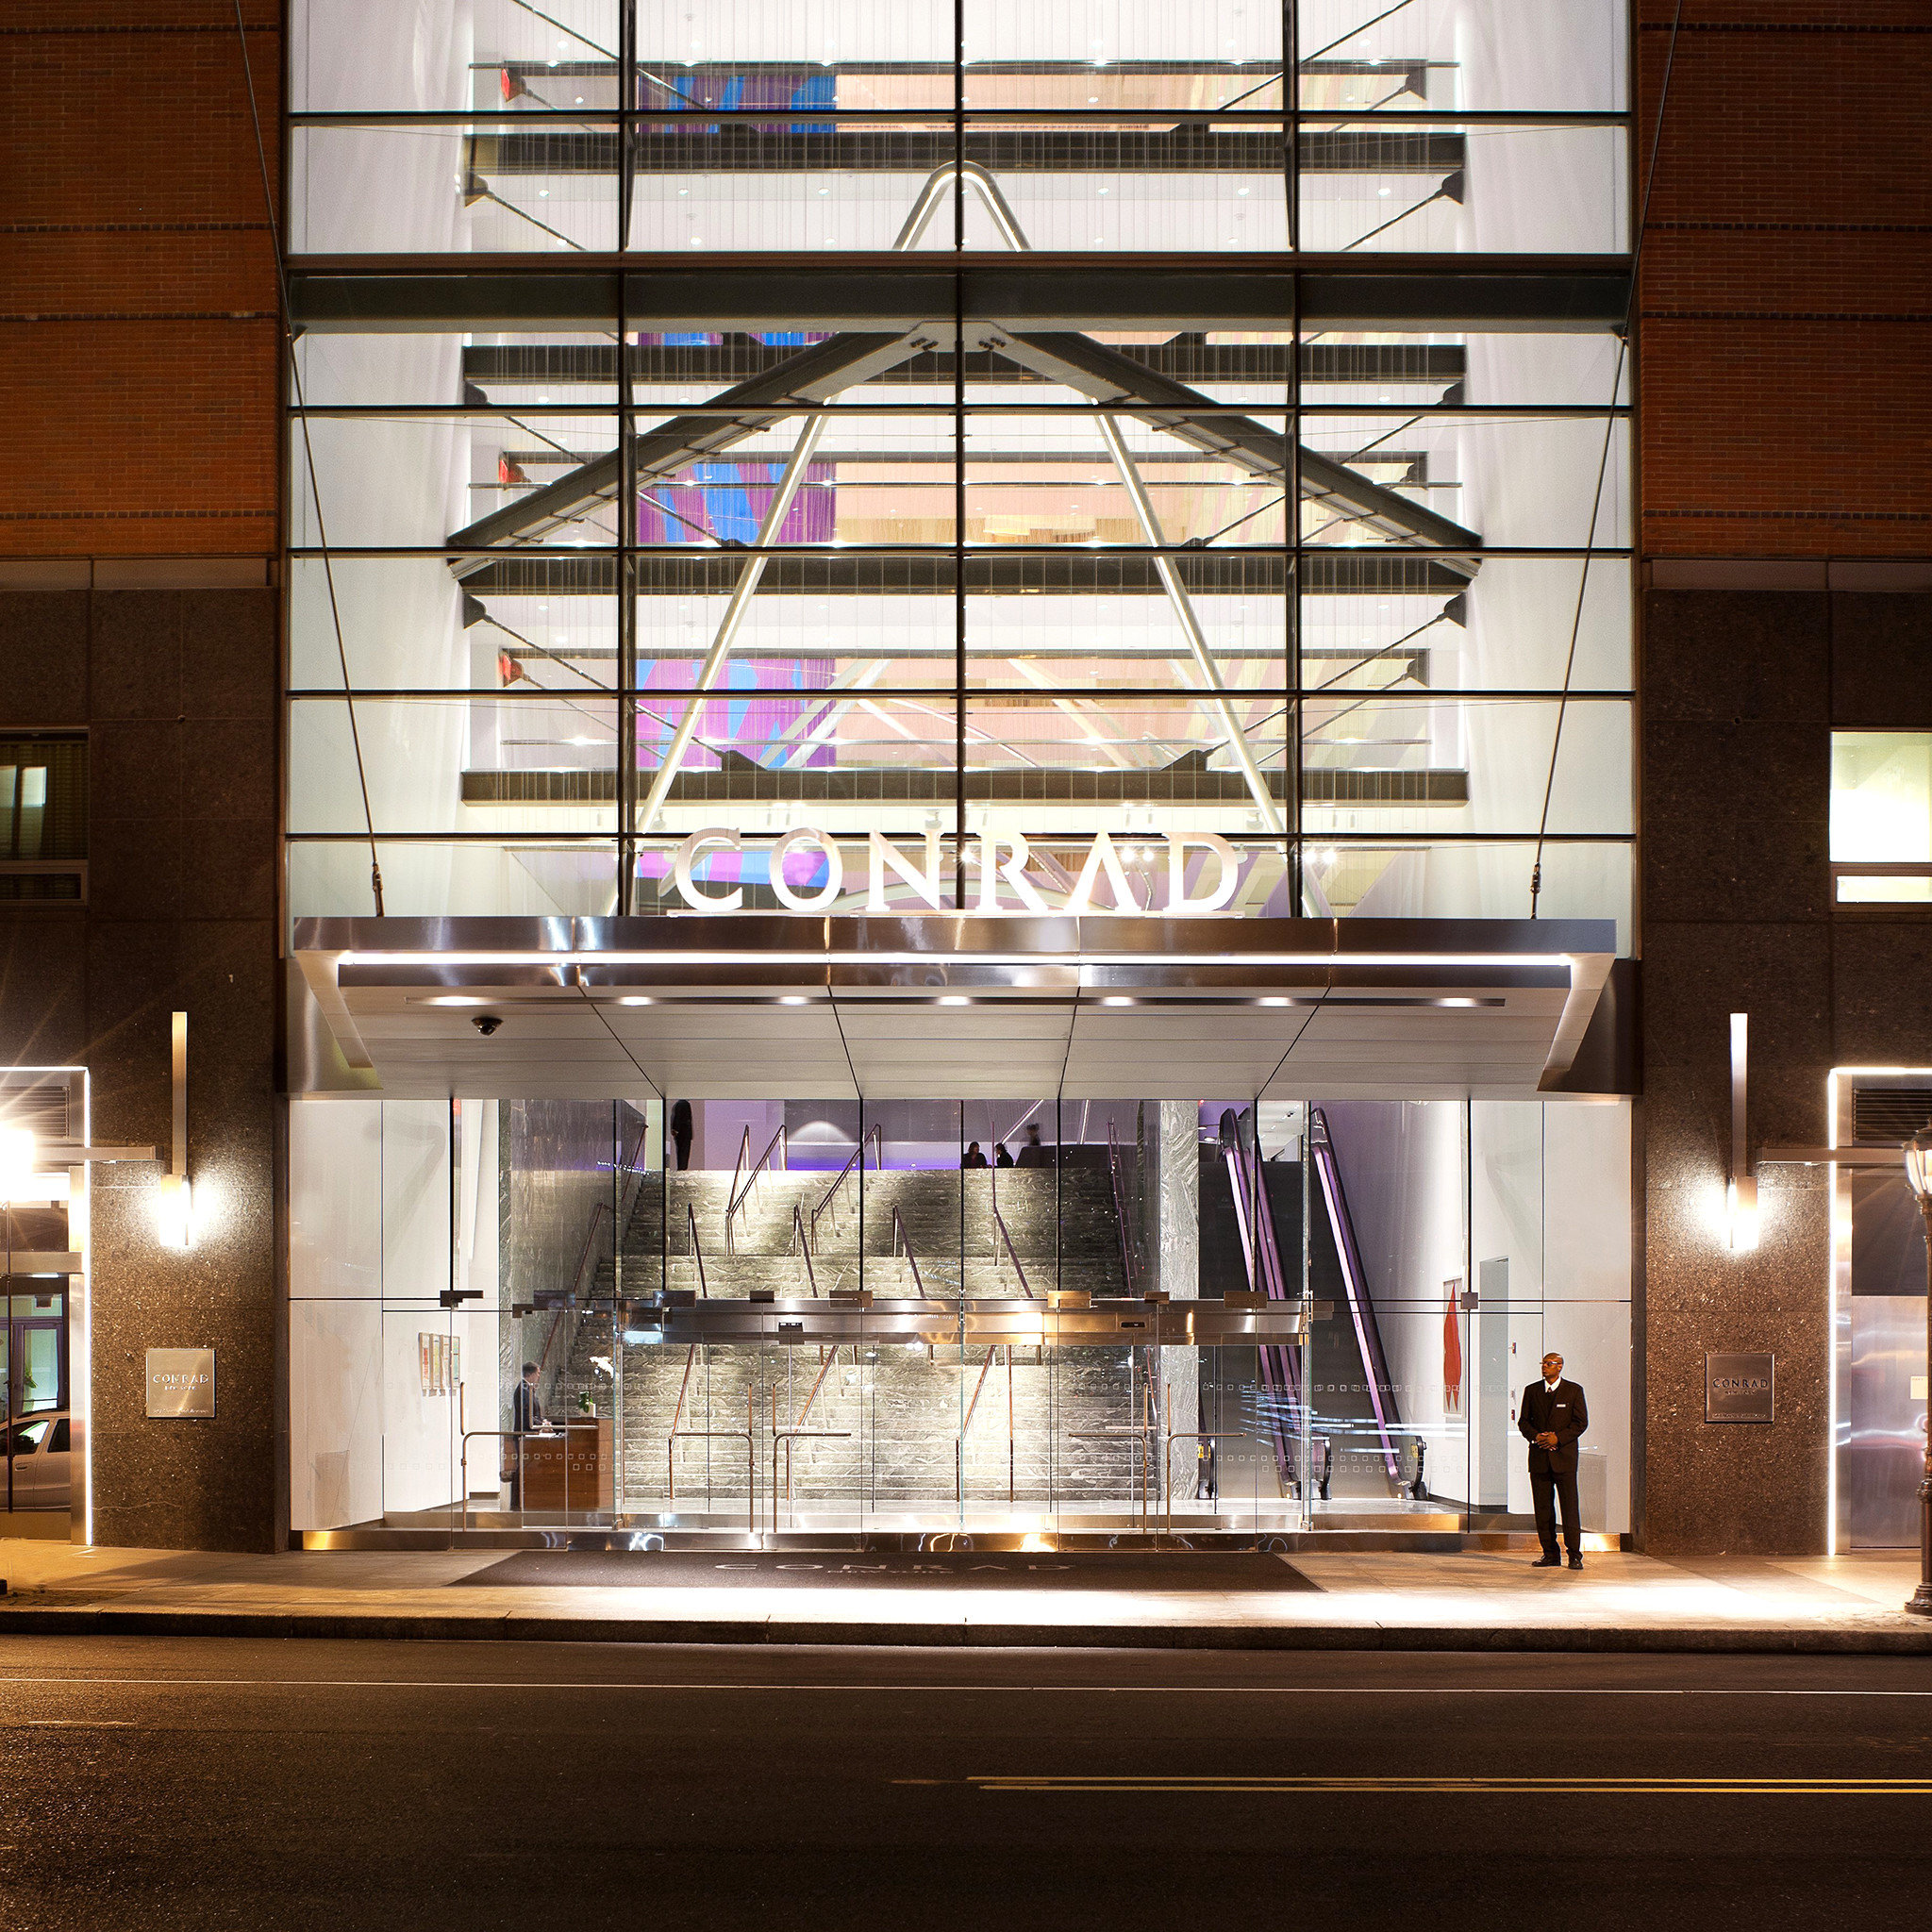 Architecture Buildings City Exterior Lobby lighting retail glass shelf